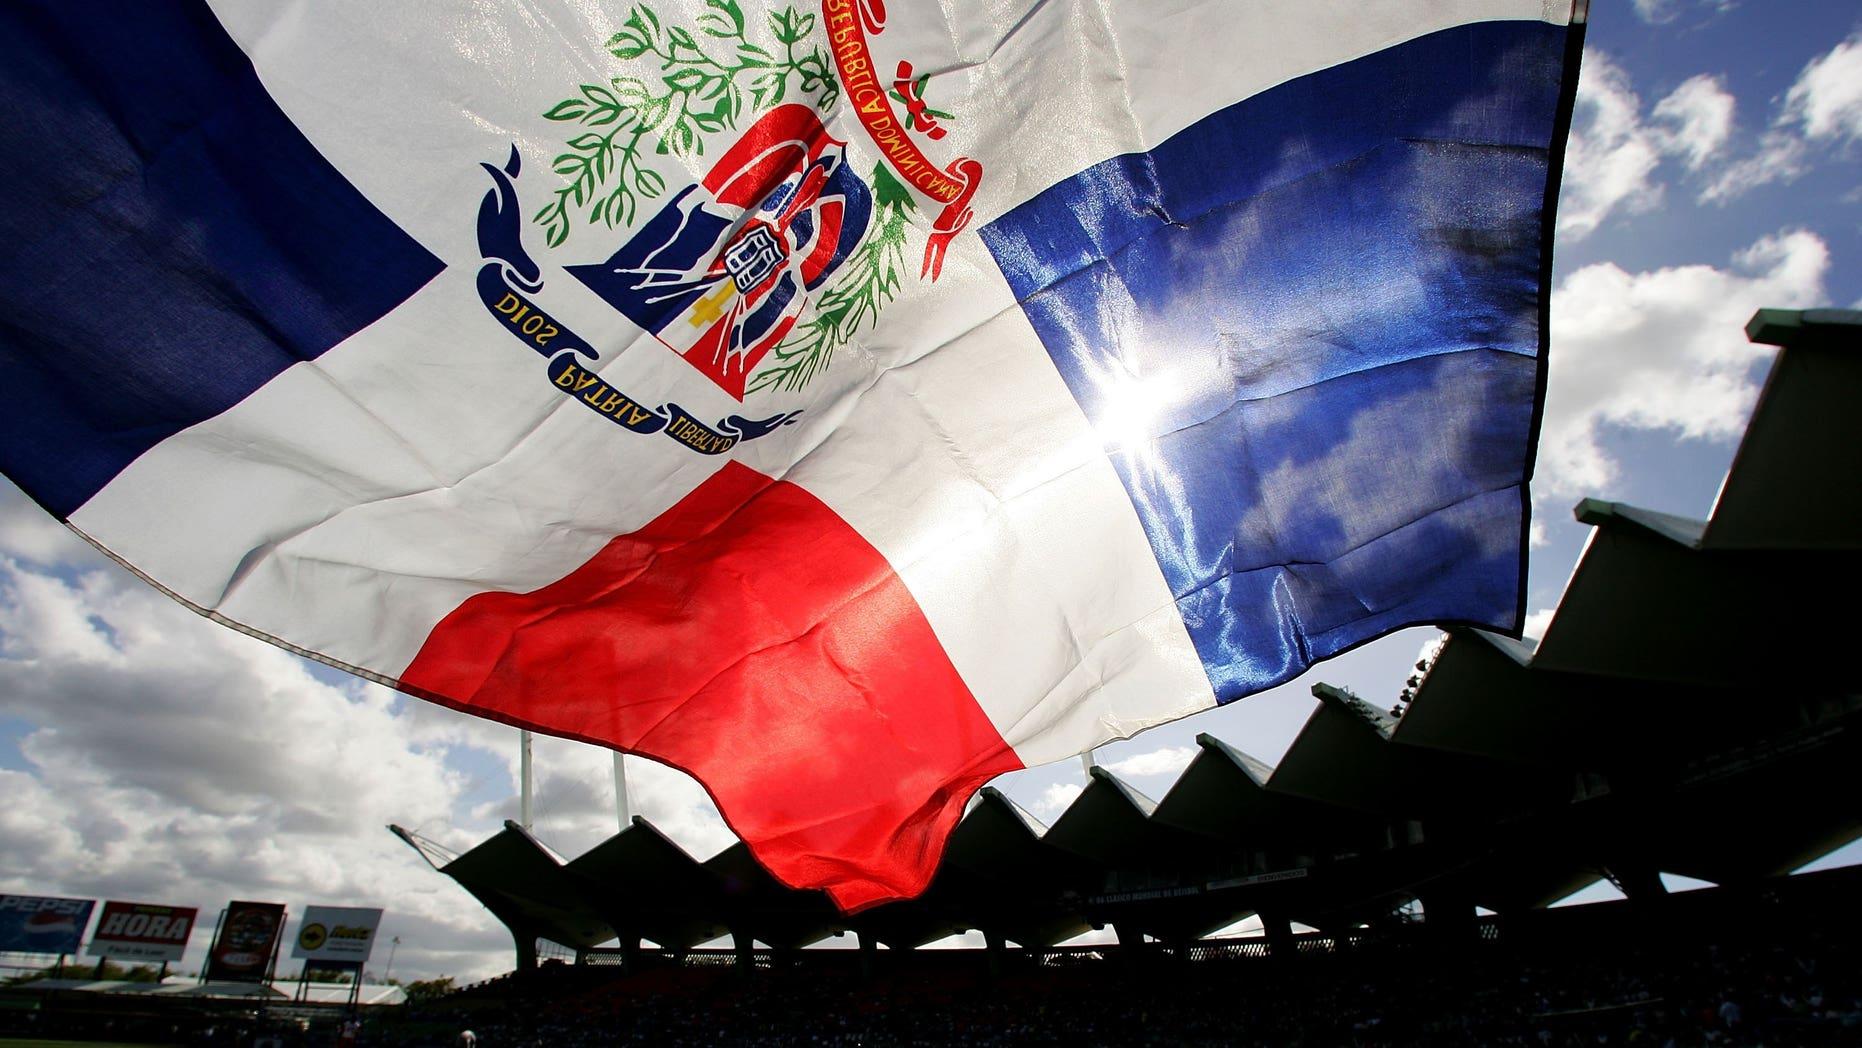 Share dominican republic flag bikini pity, that